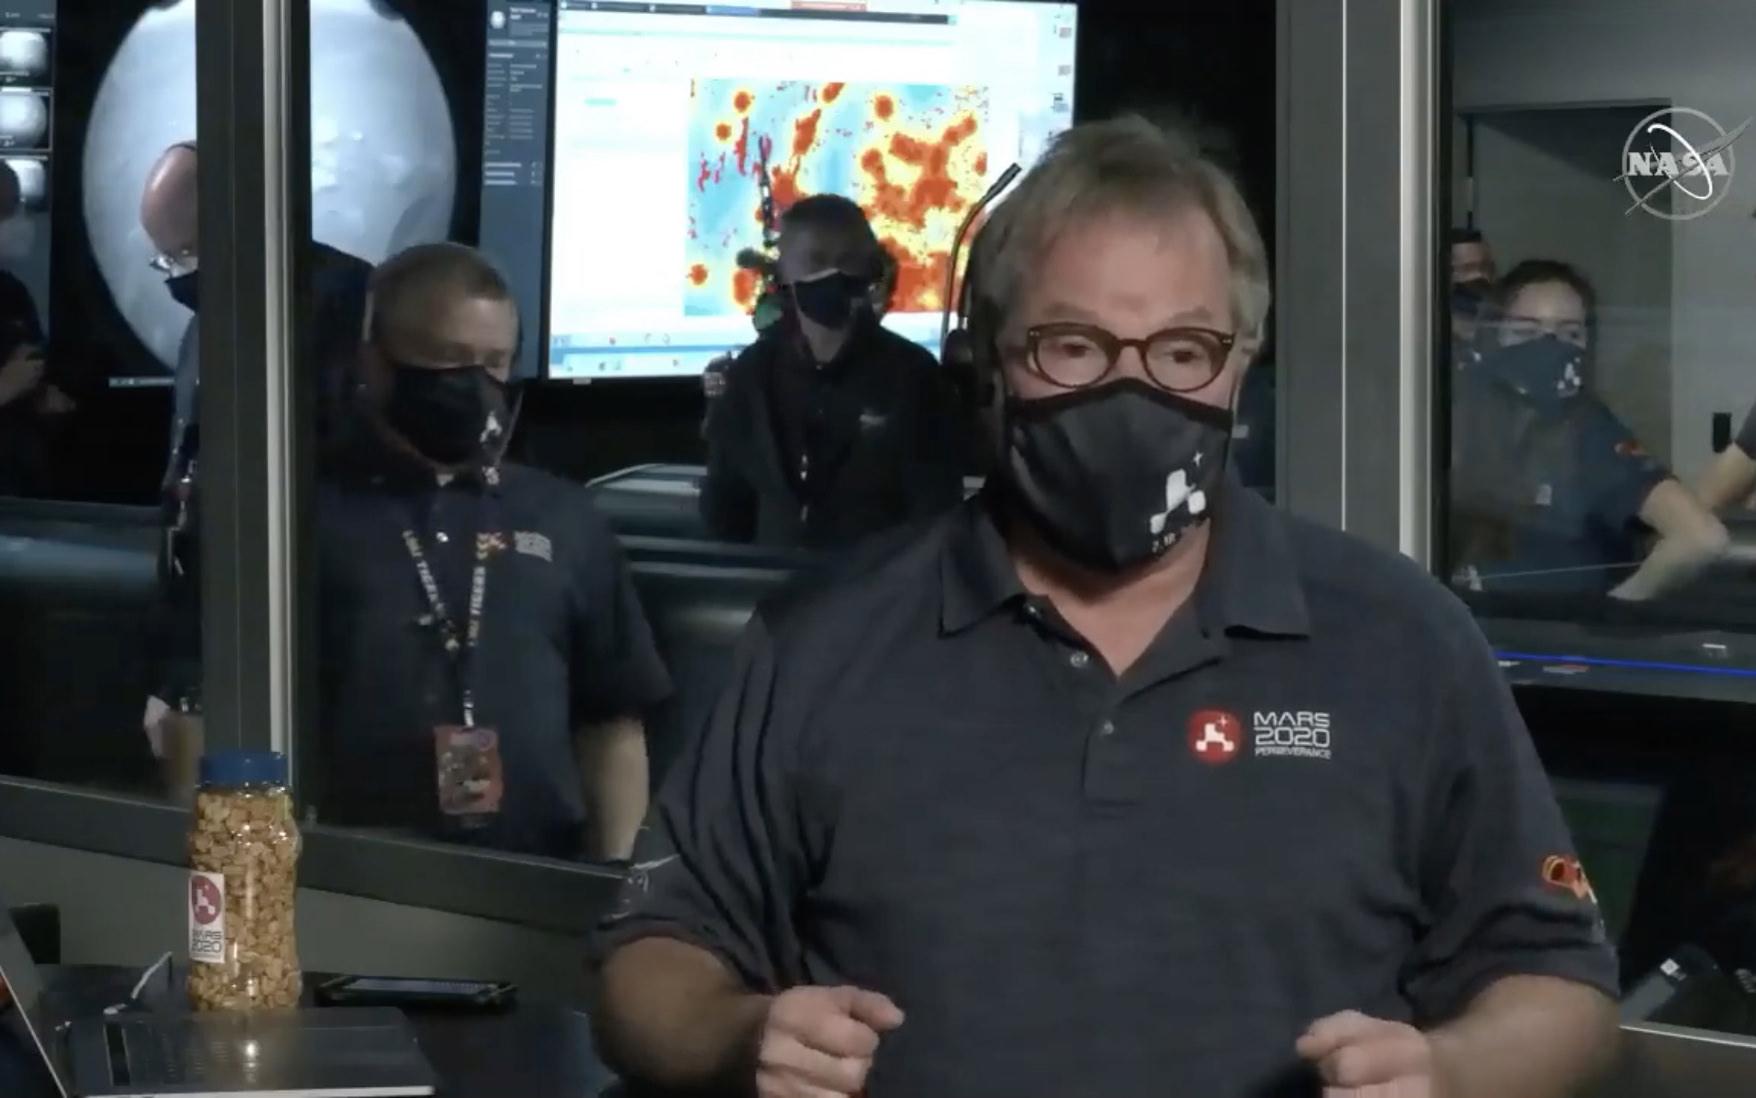 NASA engineer discussing the landing.